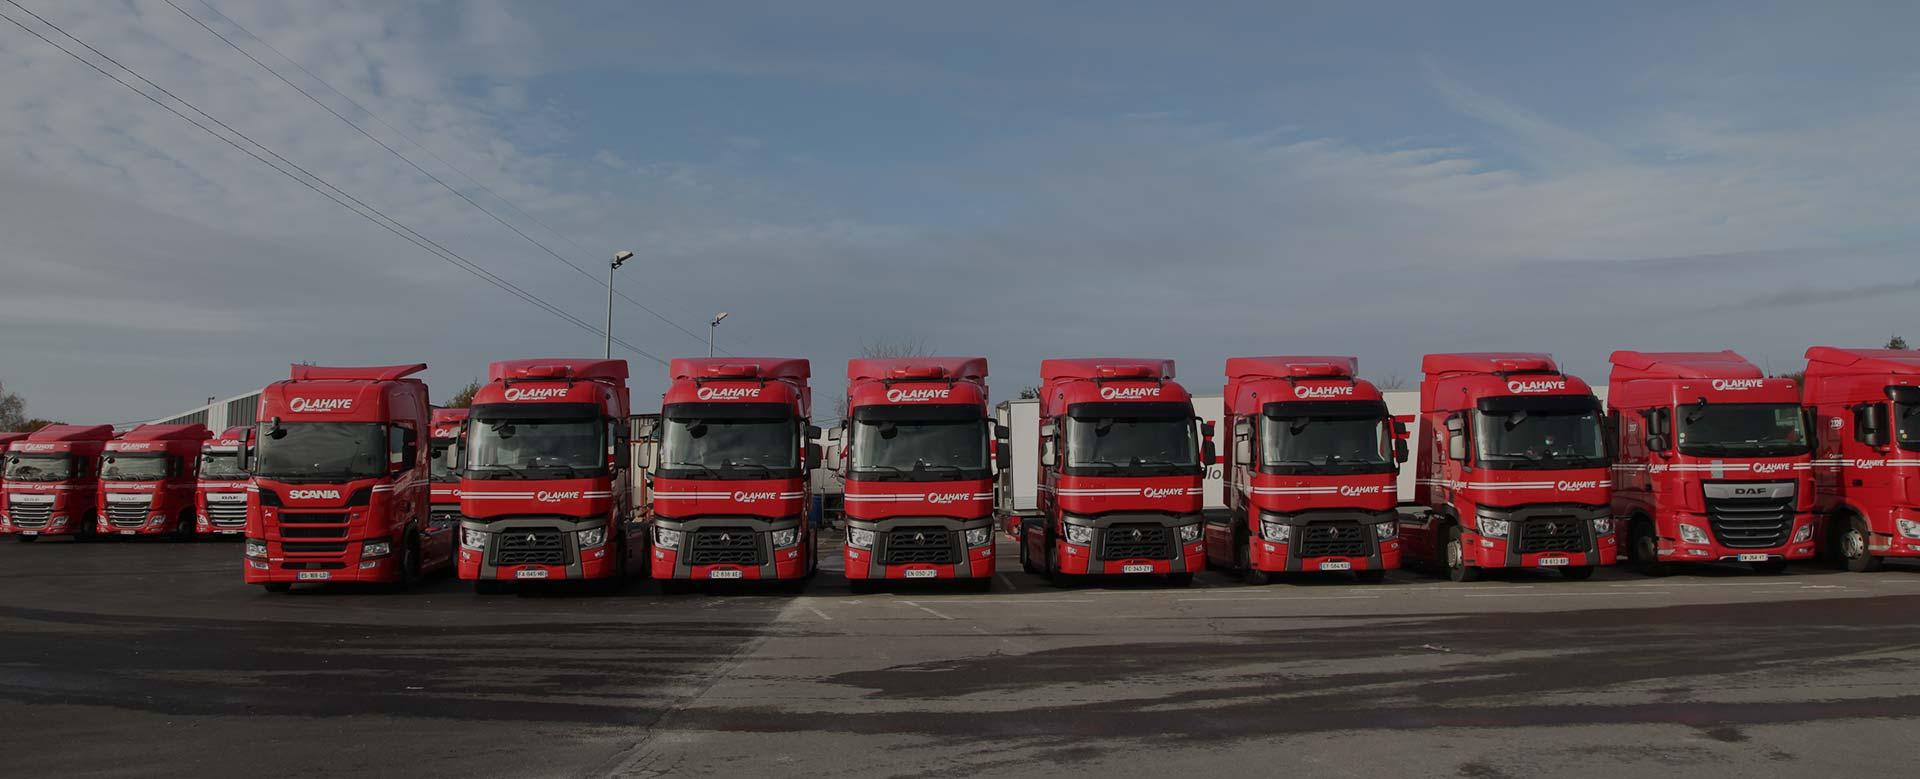 Lahaye Global Logistics Location De Vehicules Avec Conducteurs Header